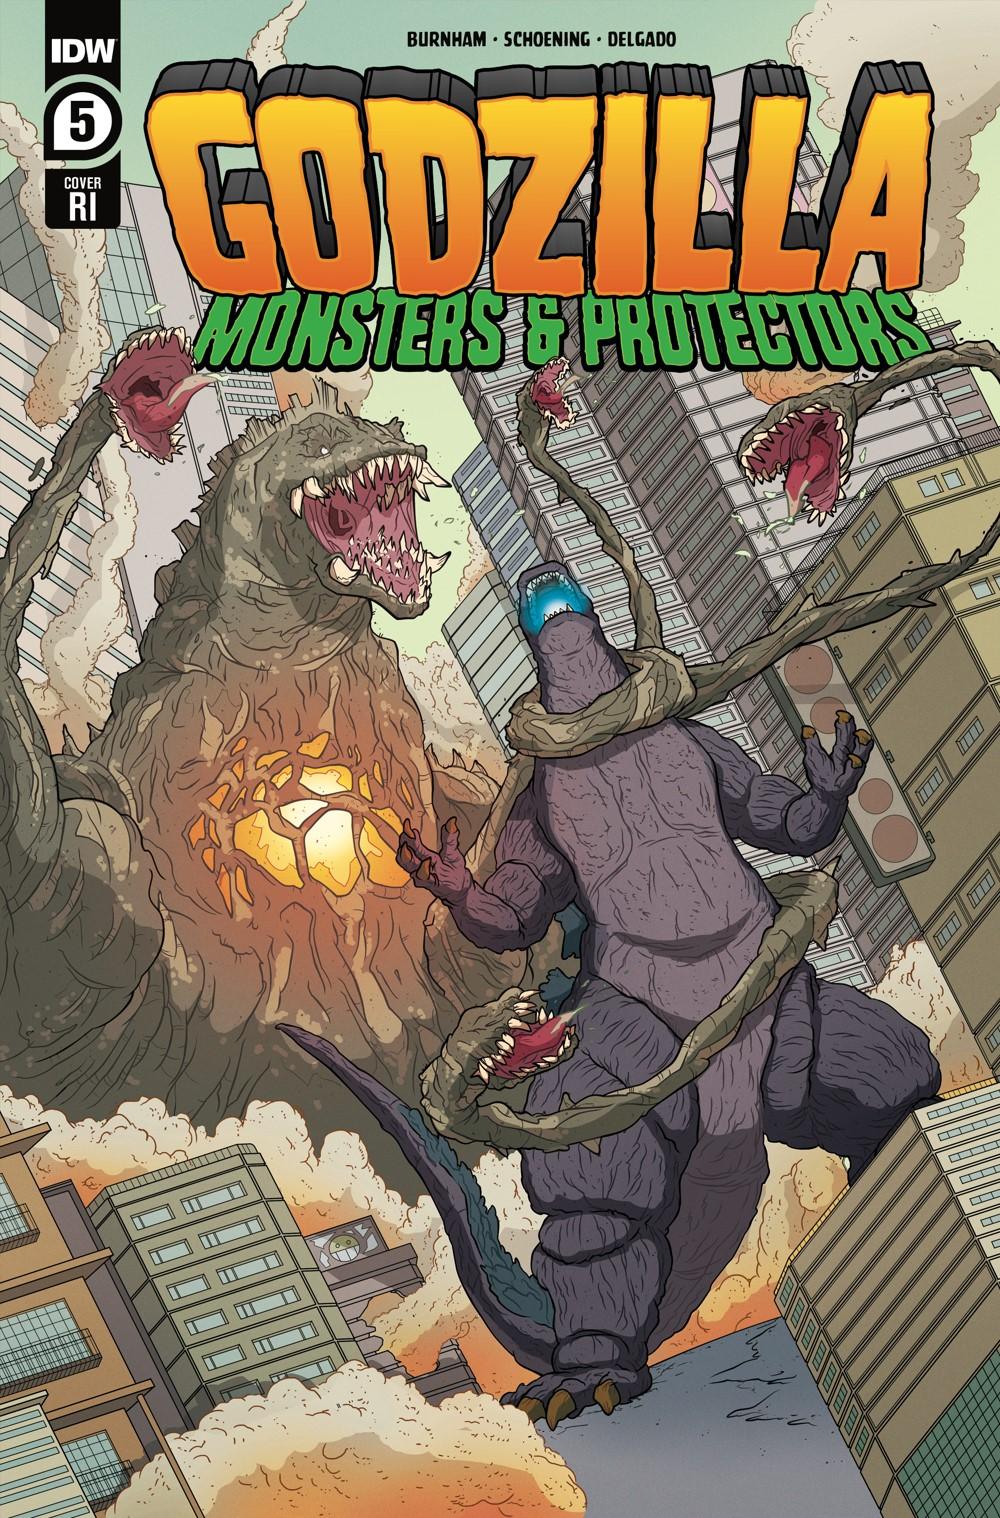 Godzilla_MP05-coverRI ComicList Previews: GODZILLA MONSTERS AND PROTECTORS #5 (OF 5)